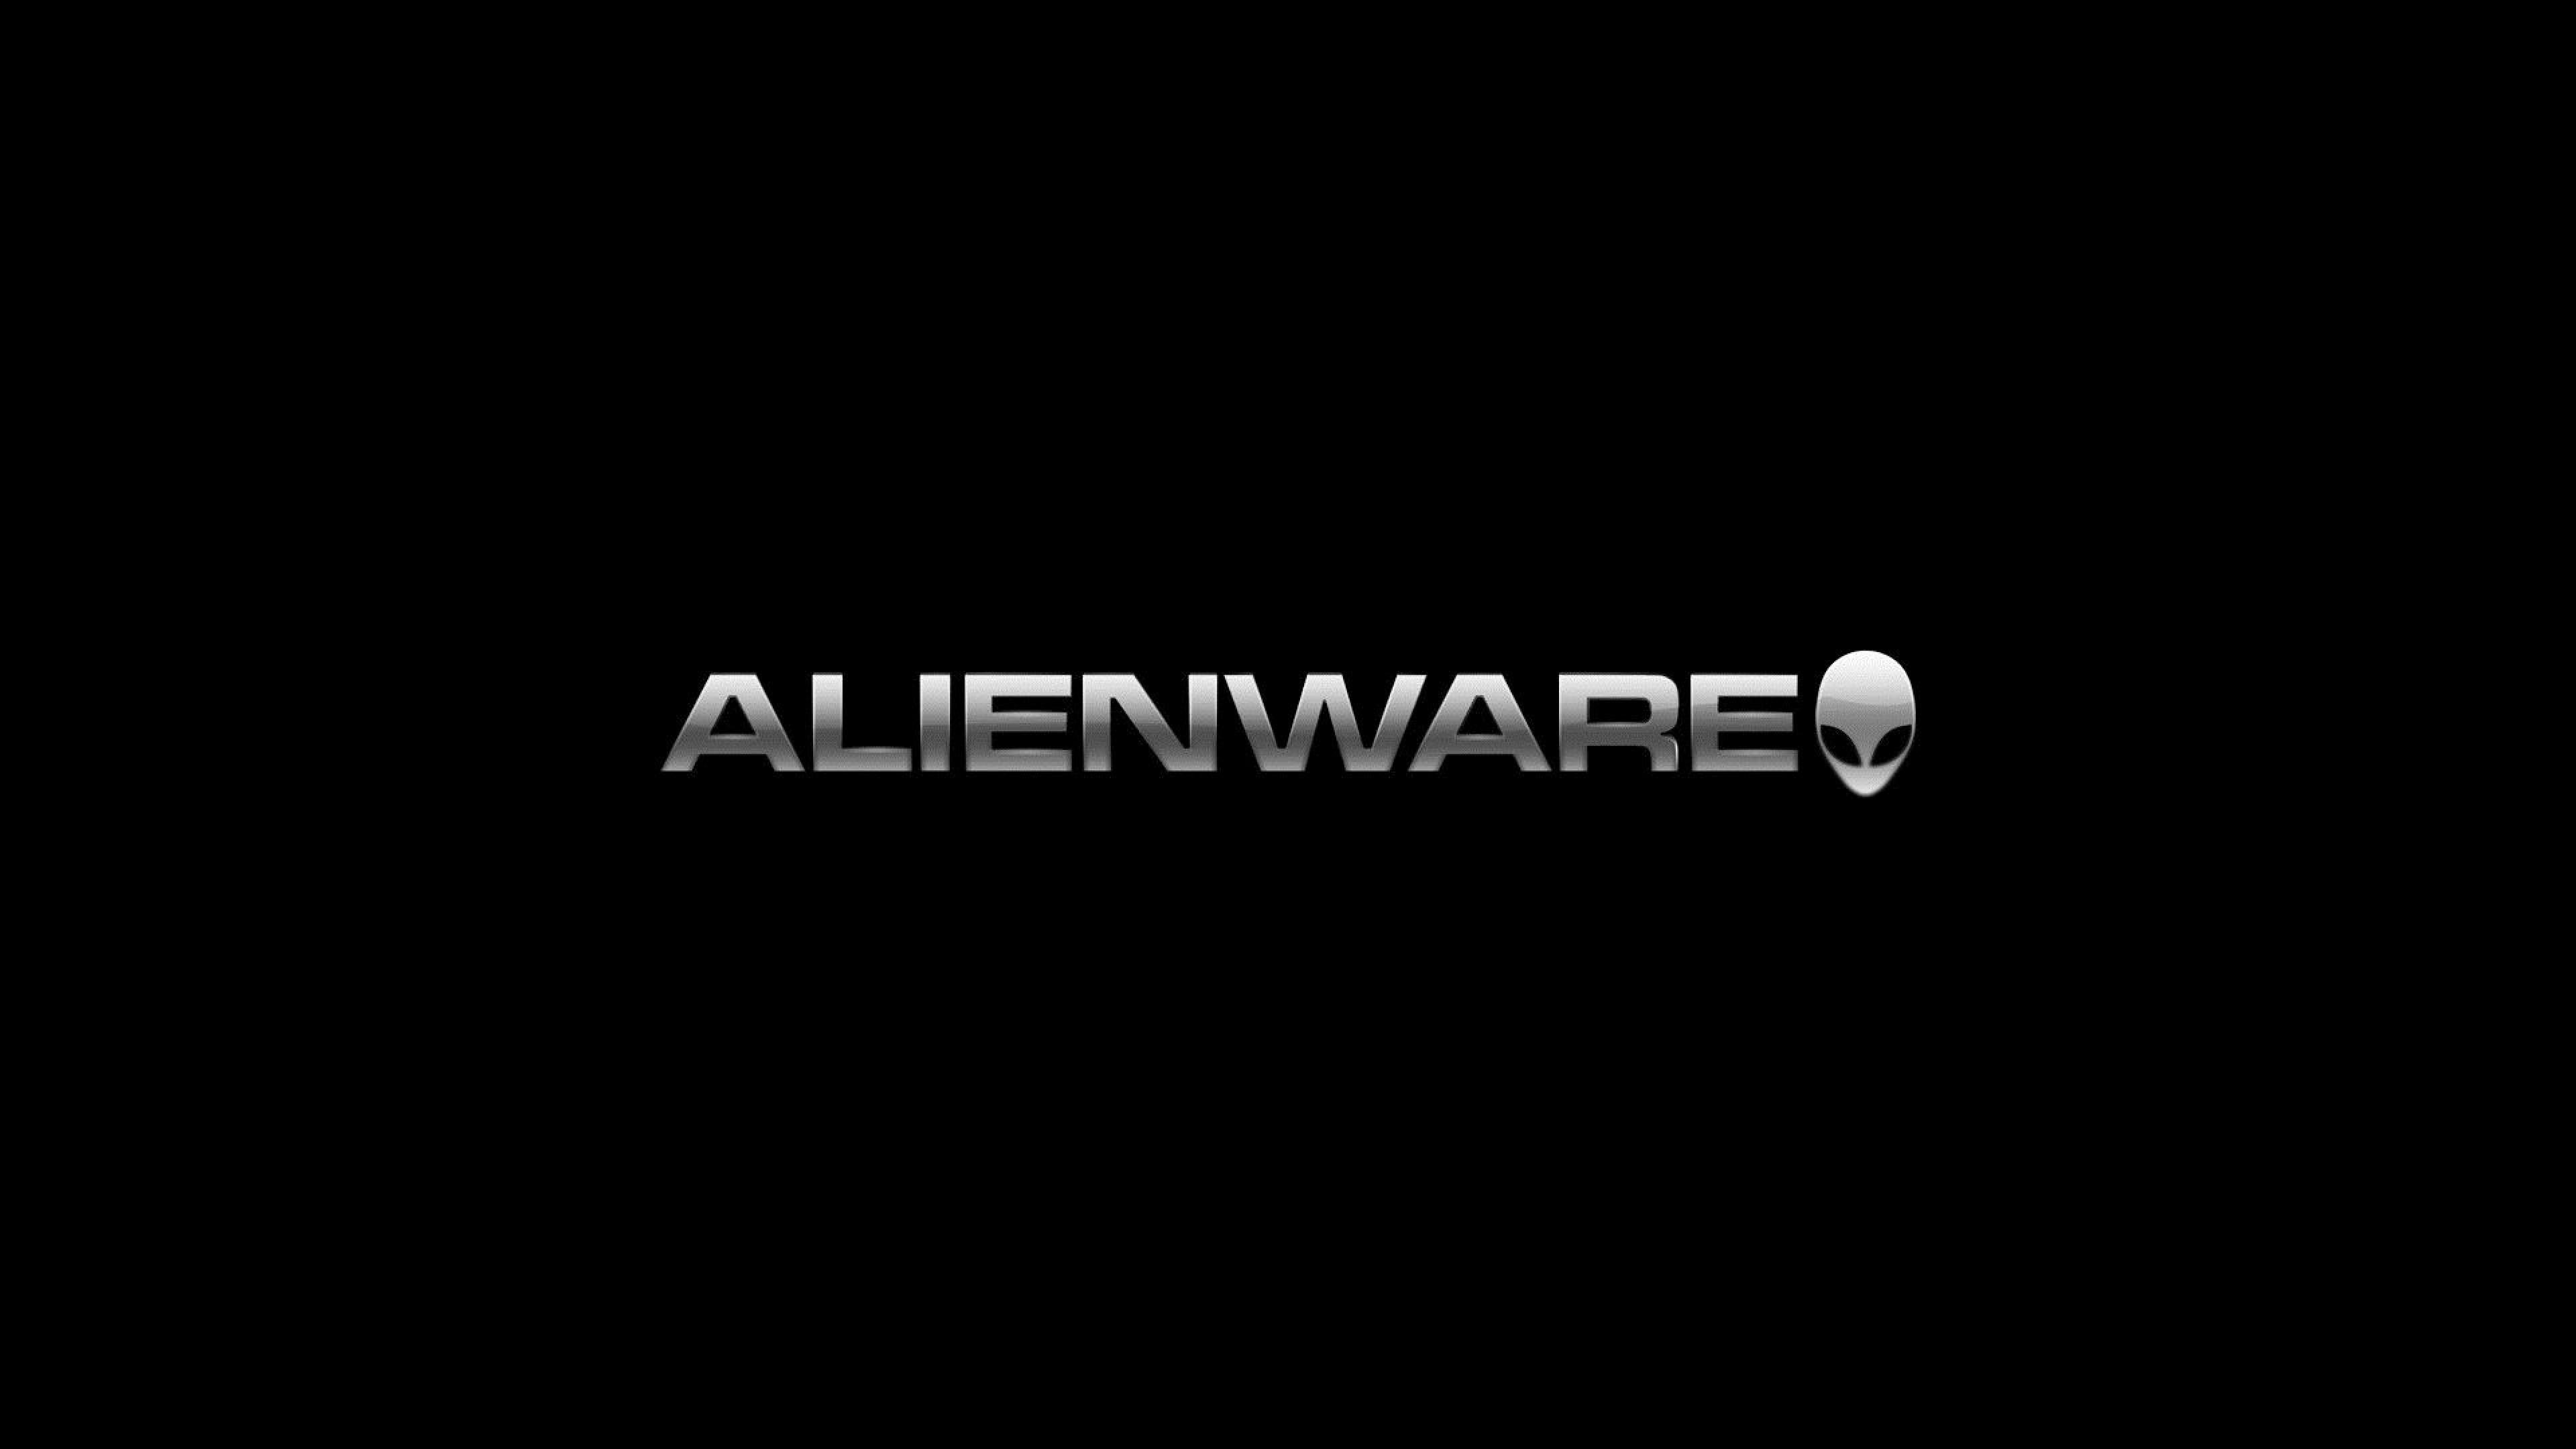 Alienware 3840x2160 Ultra HD 4K   Wallpaper   ImgPrix 3840x2160